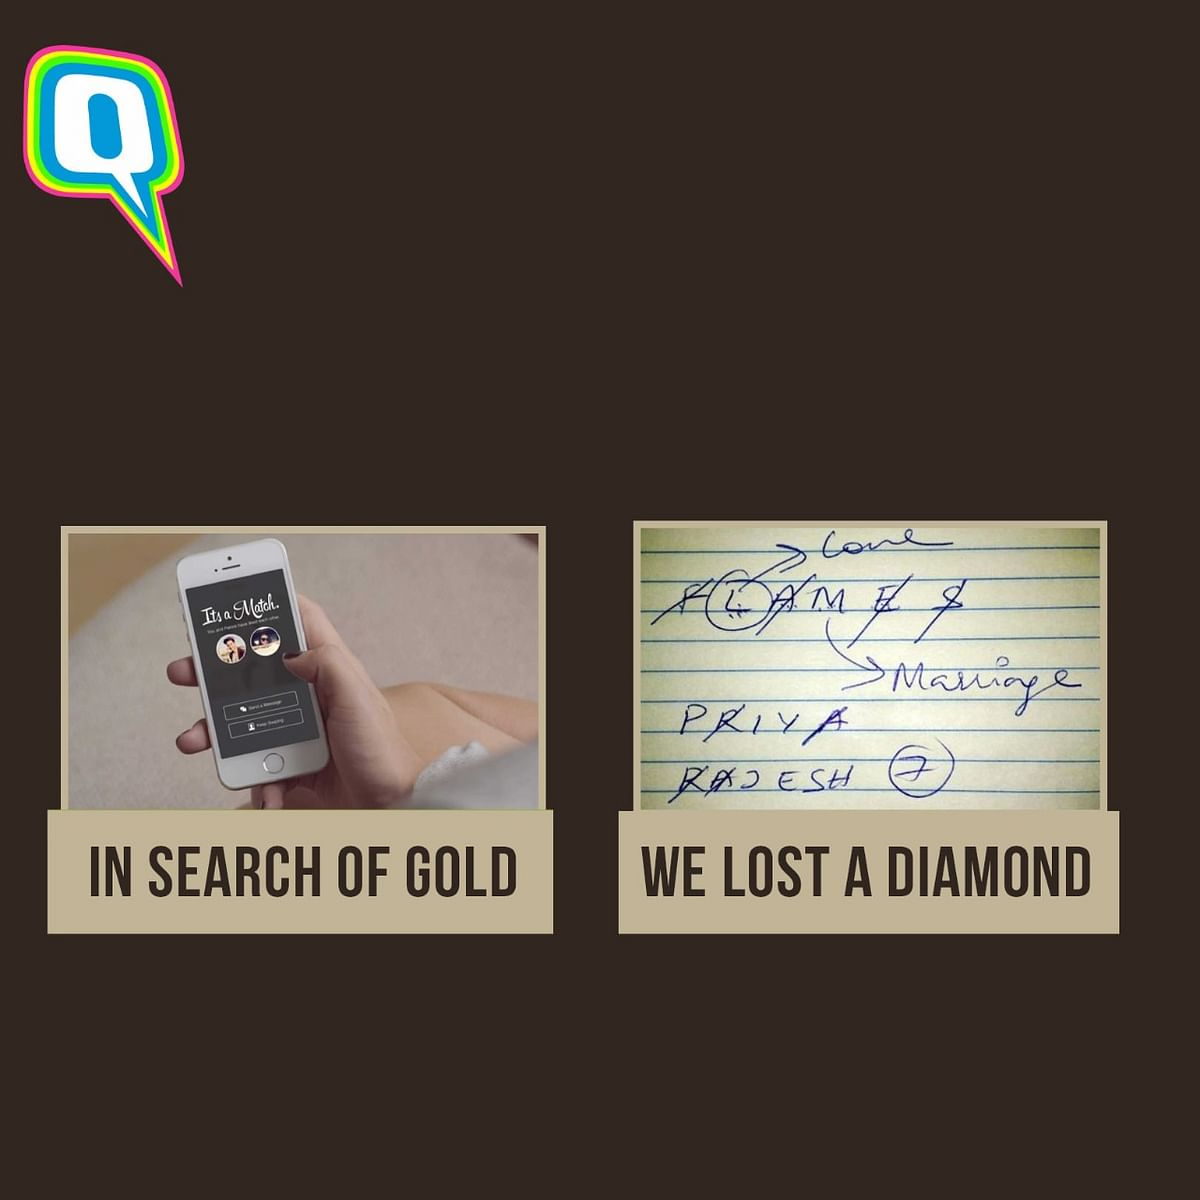 Peak Nostalgia Alert as 'In Search of Gold' Memes Go Viral